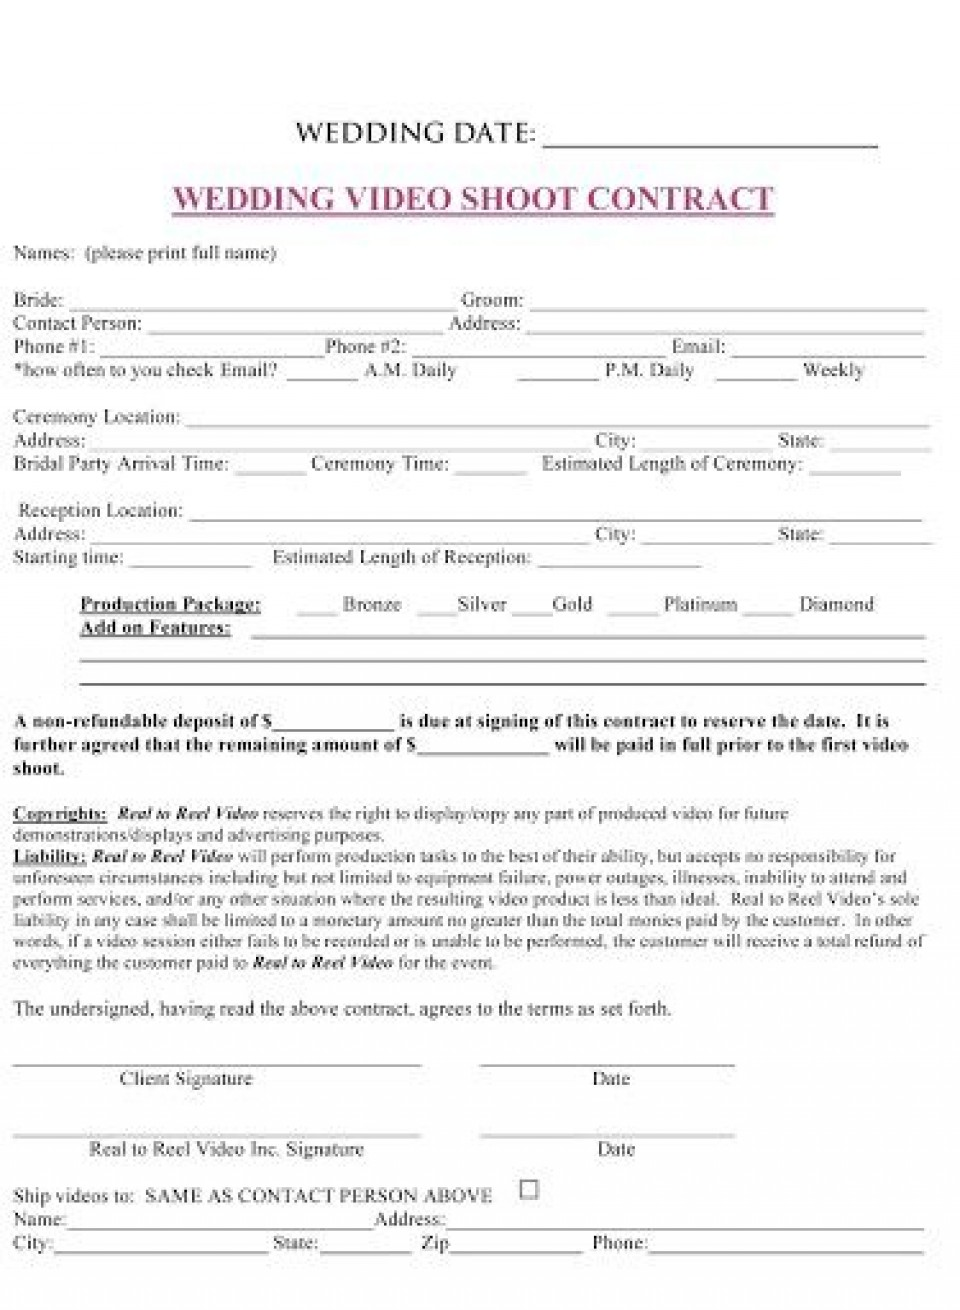 009 Top Wedding Planner Contract Template Highest Quality  Uk Australia960